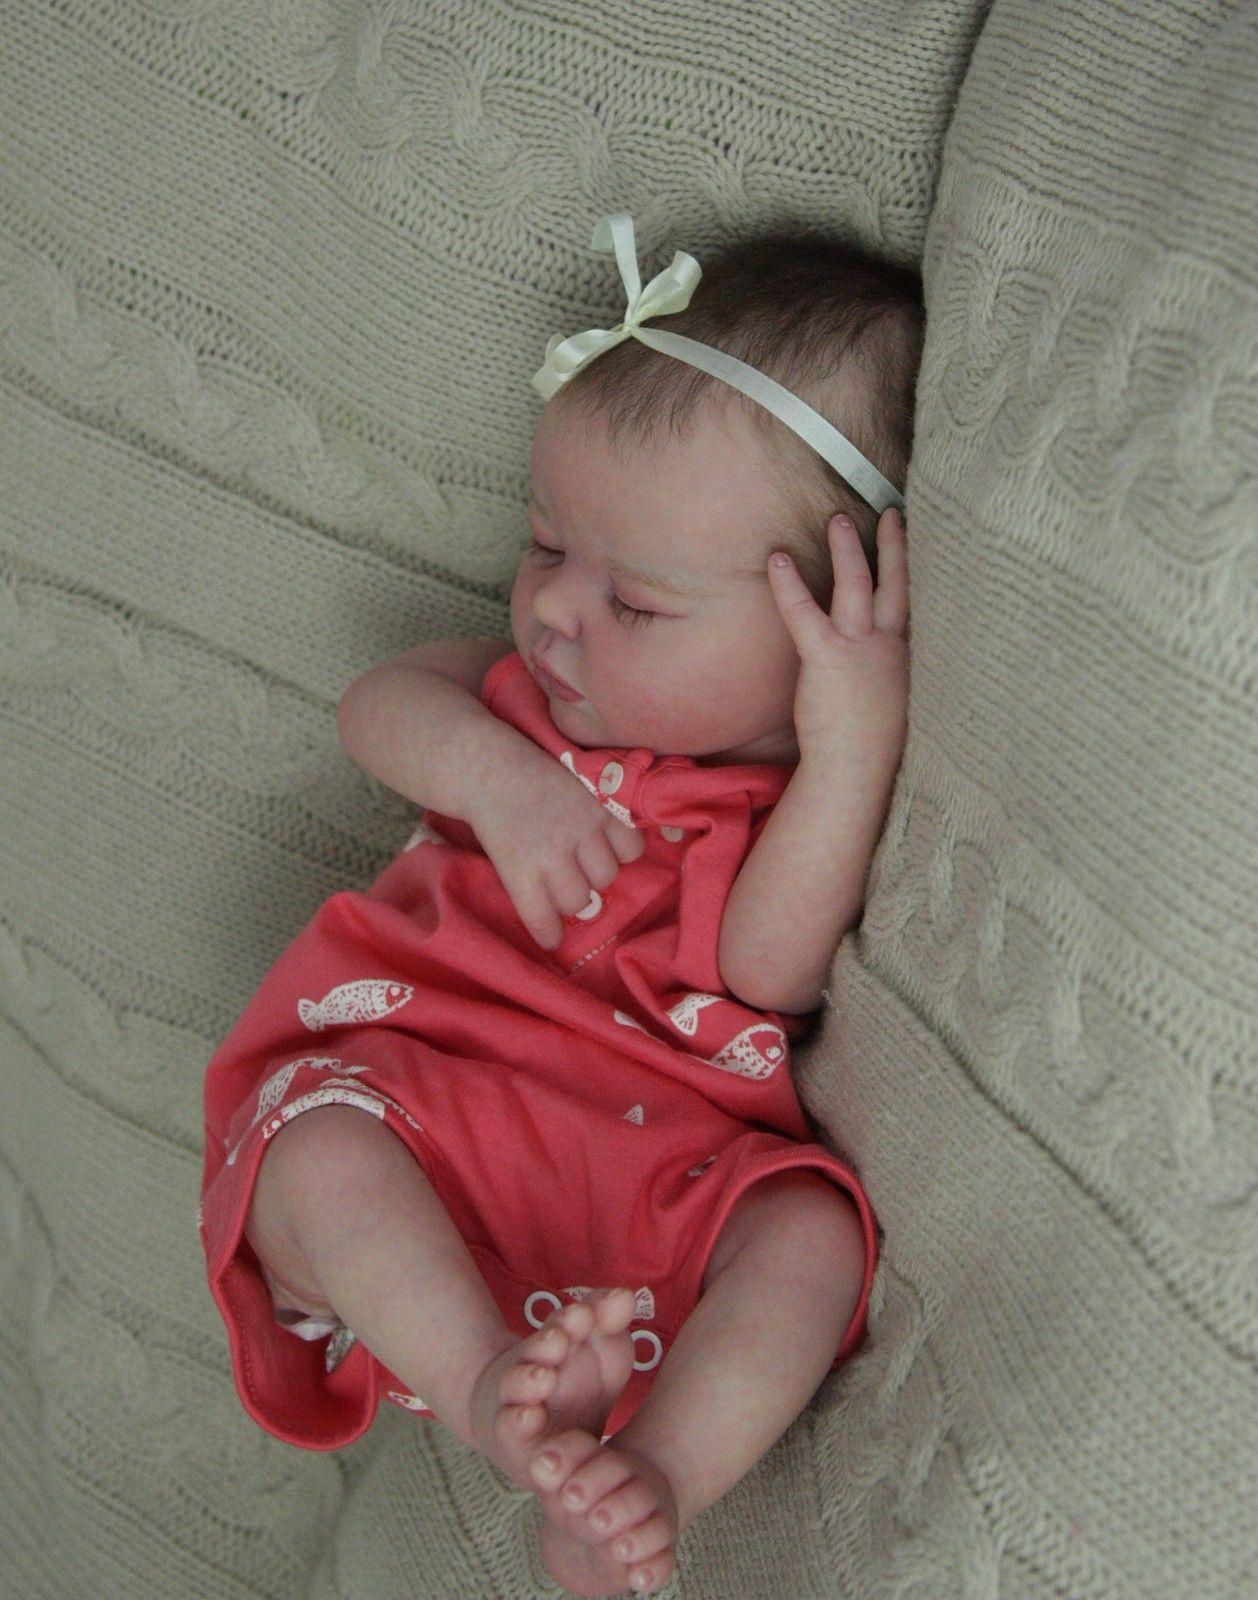 Prototype Reborn Baby Angel By Bonnie Sieben Iiora